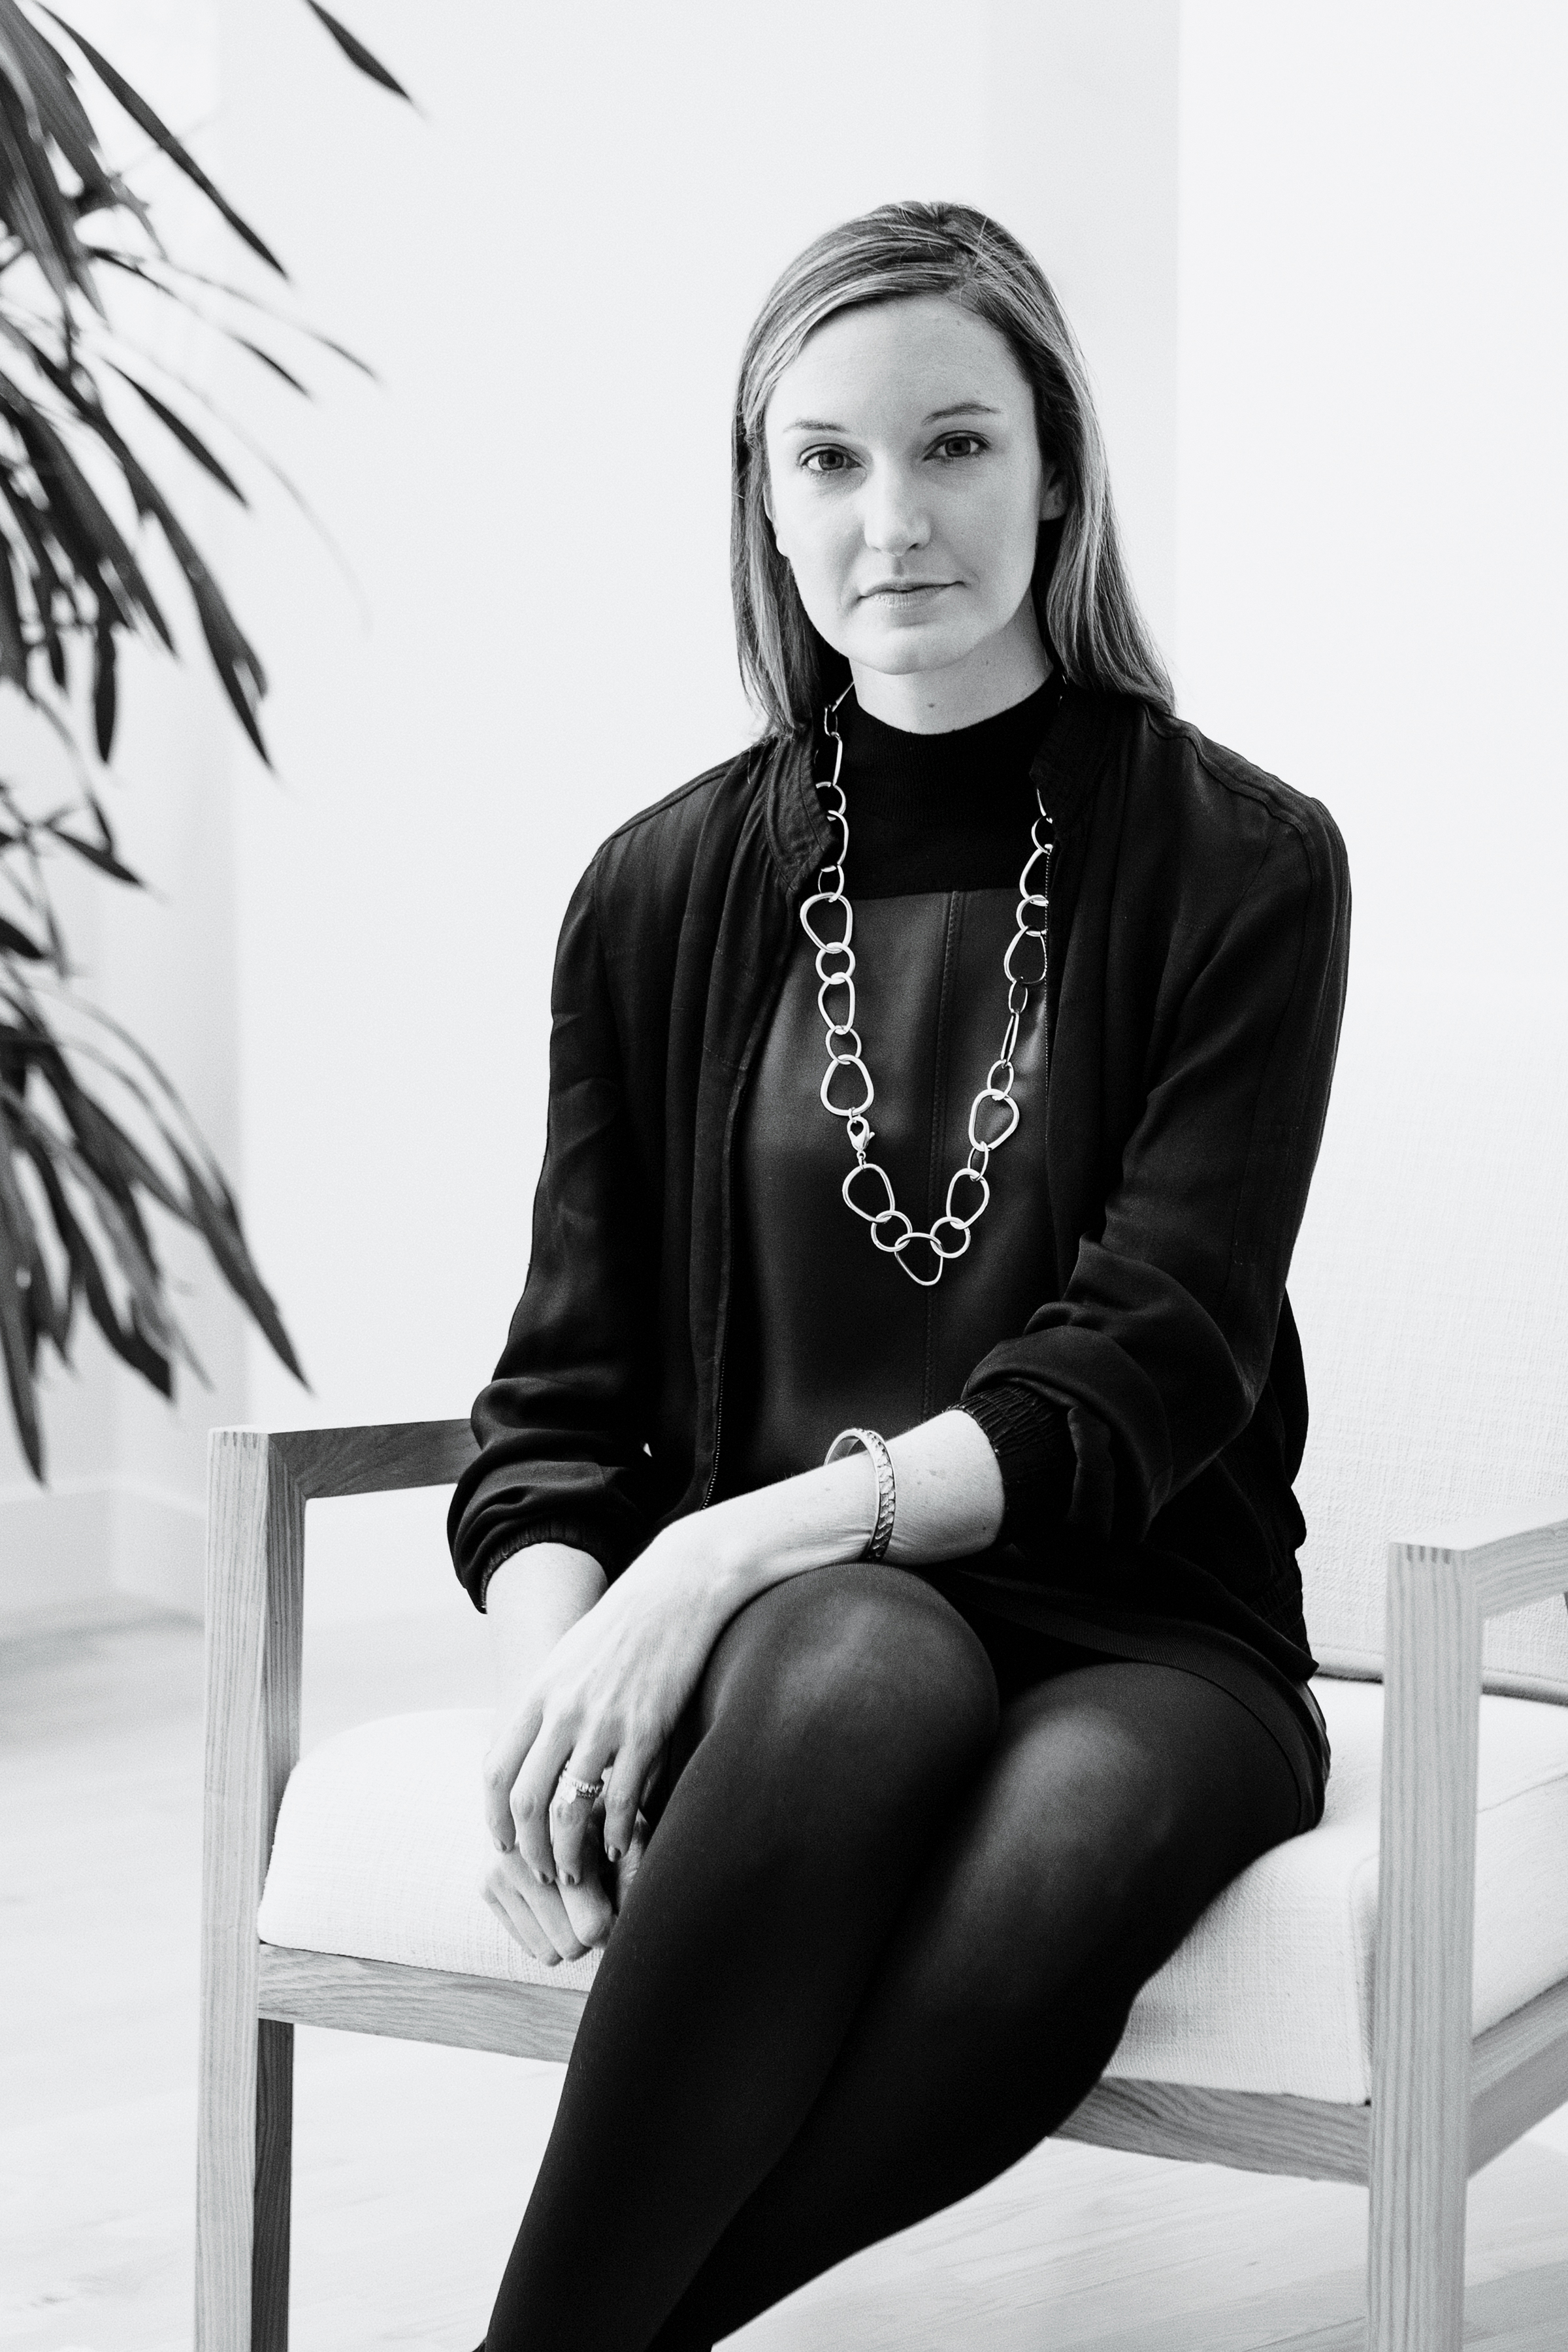 Julia Hamilton Trost